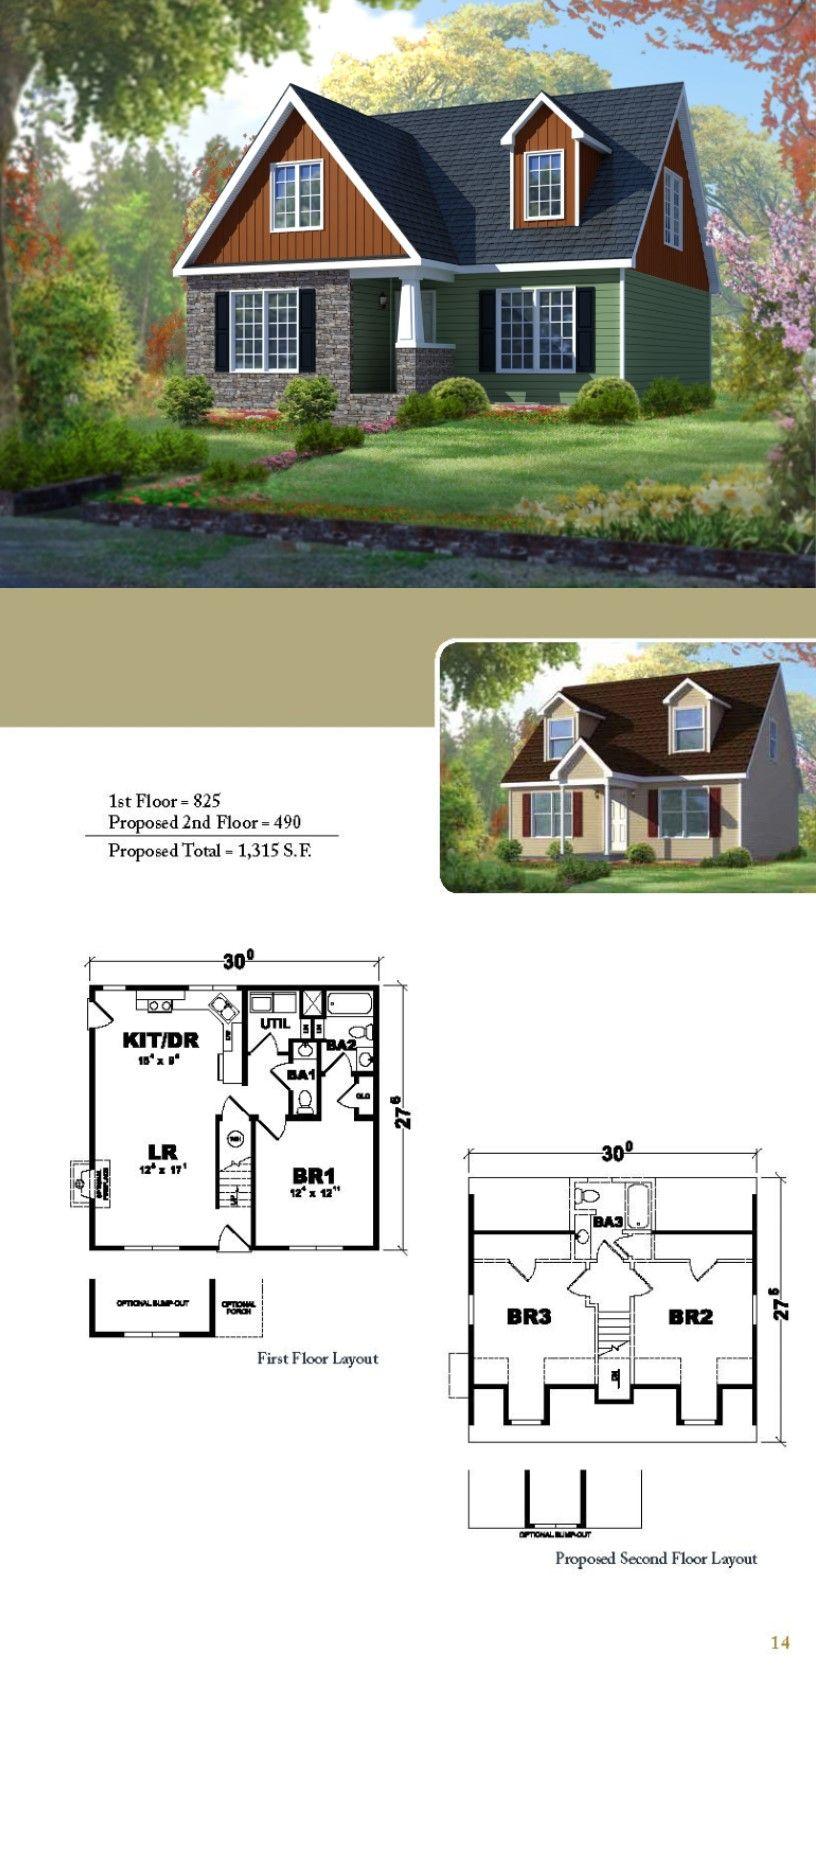 The Barclay A Cape Cod Style Home Cape Cod House House Plans House Blueprints